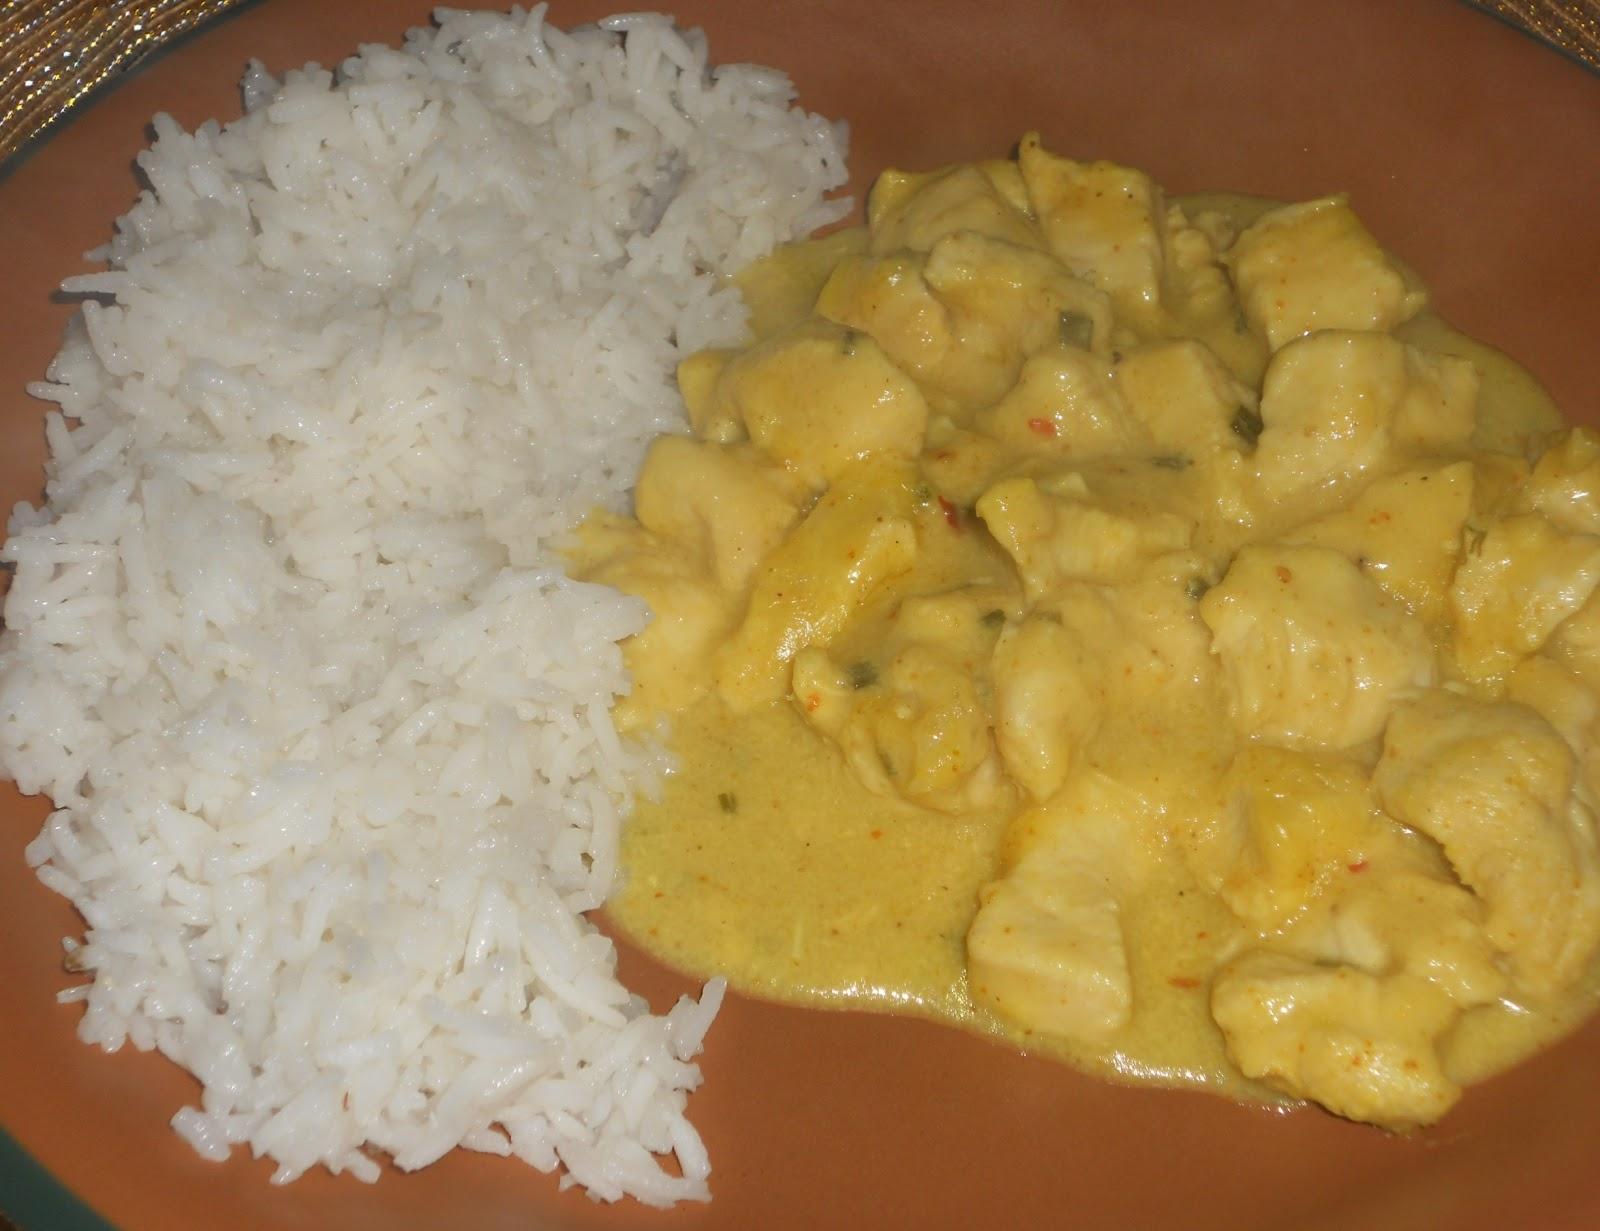 http://3.bp.blogspot.com/-qXWpxx3_jiM/UND9EaKbXkI/AAAAAAAABZQ/1R8jcwpkMh0/s1600/pollo+indiano.jpg